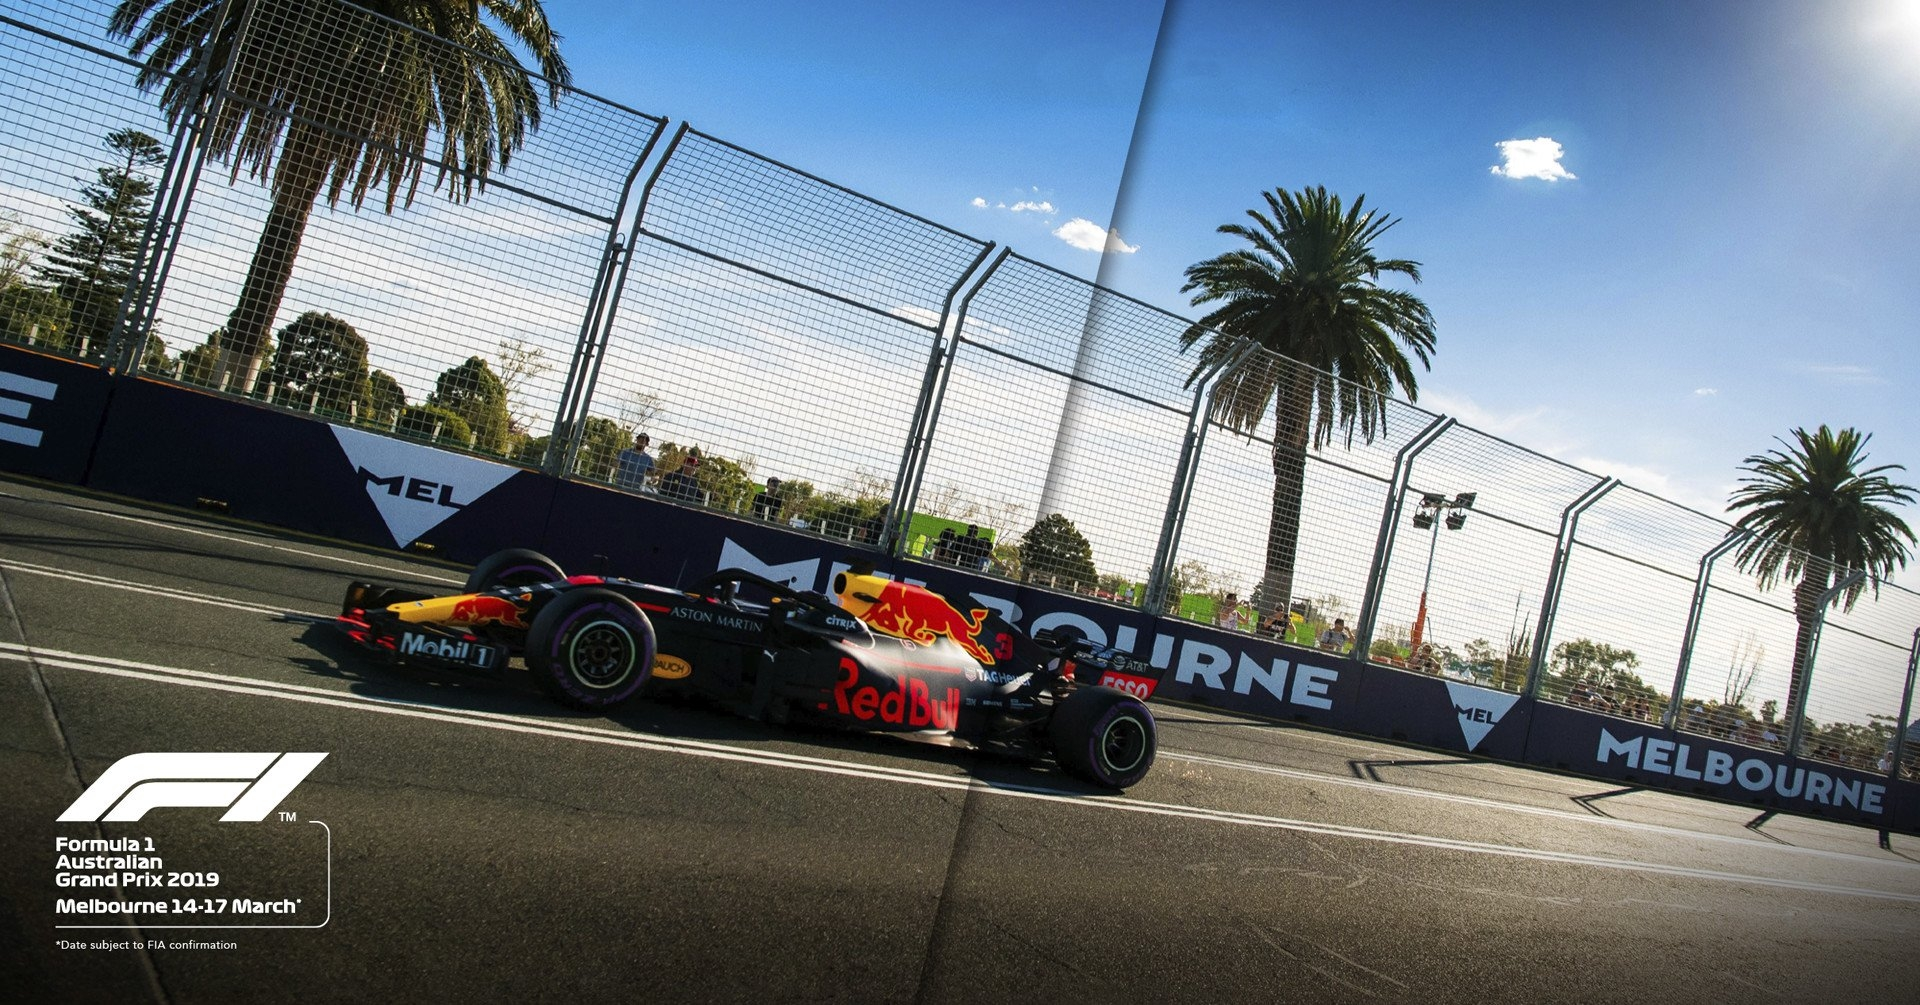 F1 Australian Grand Prix 2019 Date: Melbourne Claims Pole Position Formula E Calendar 2019 Ical